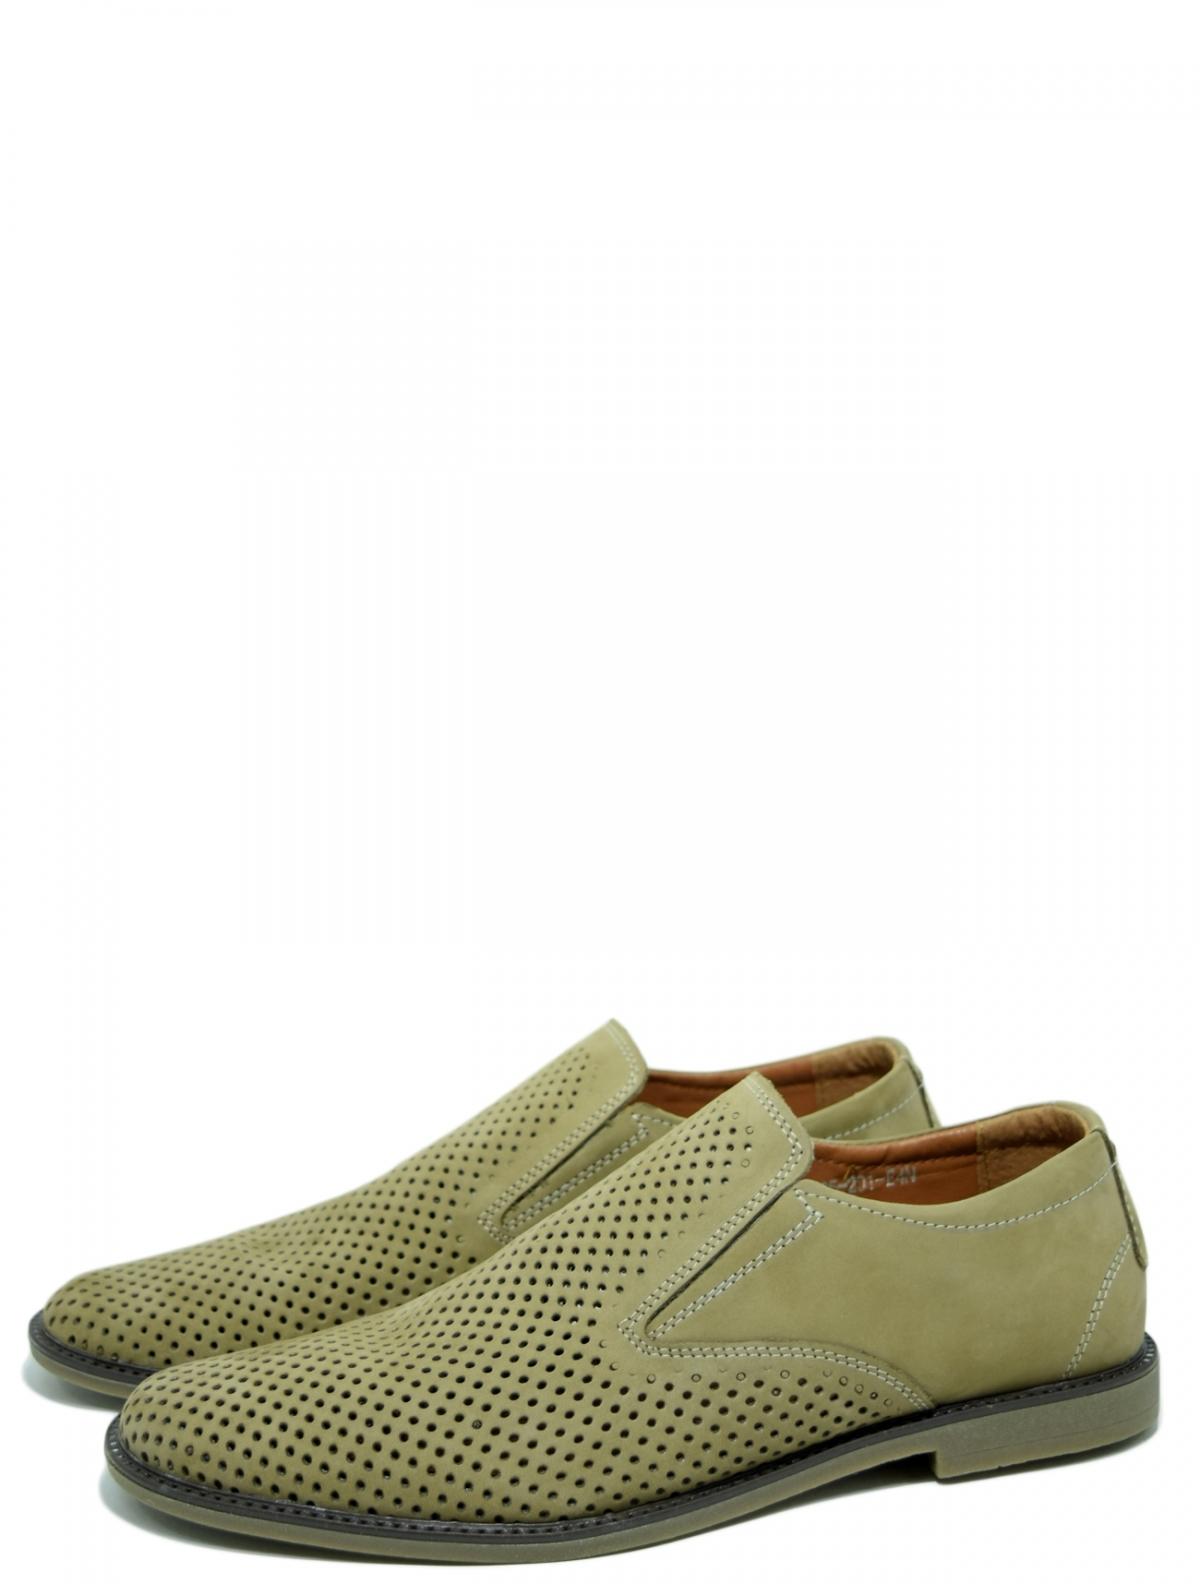 Rooman 905-201-E4N мужские туфли